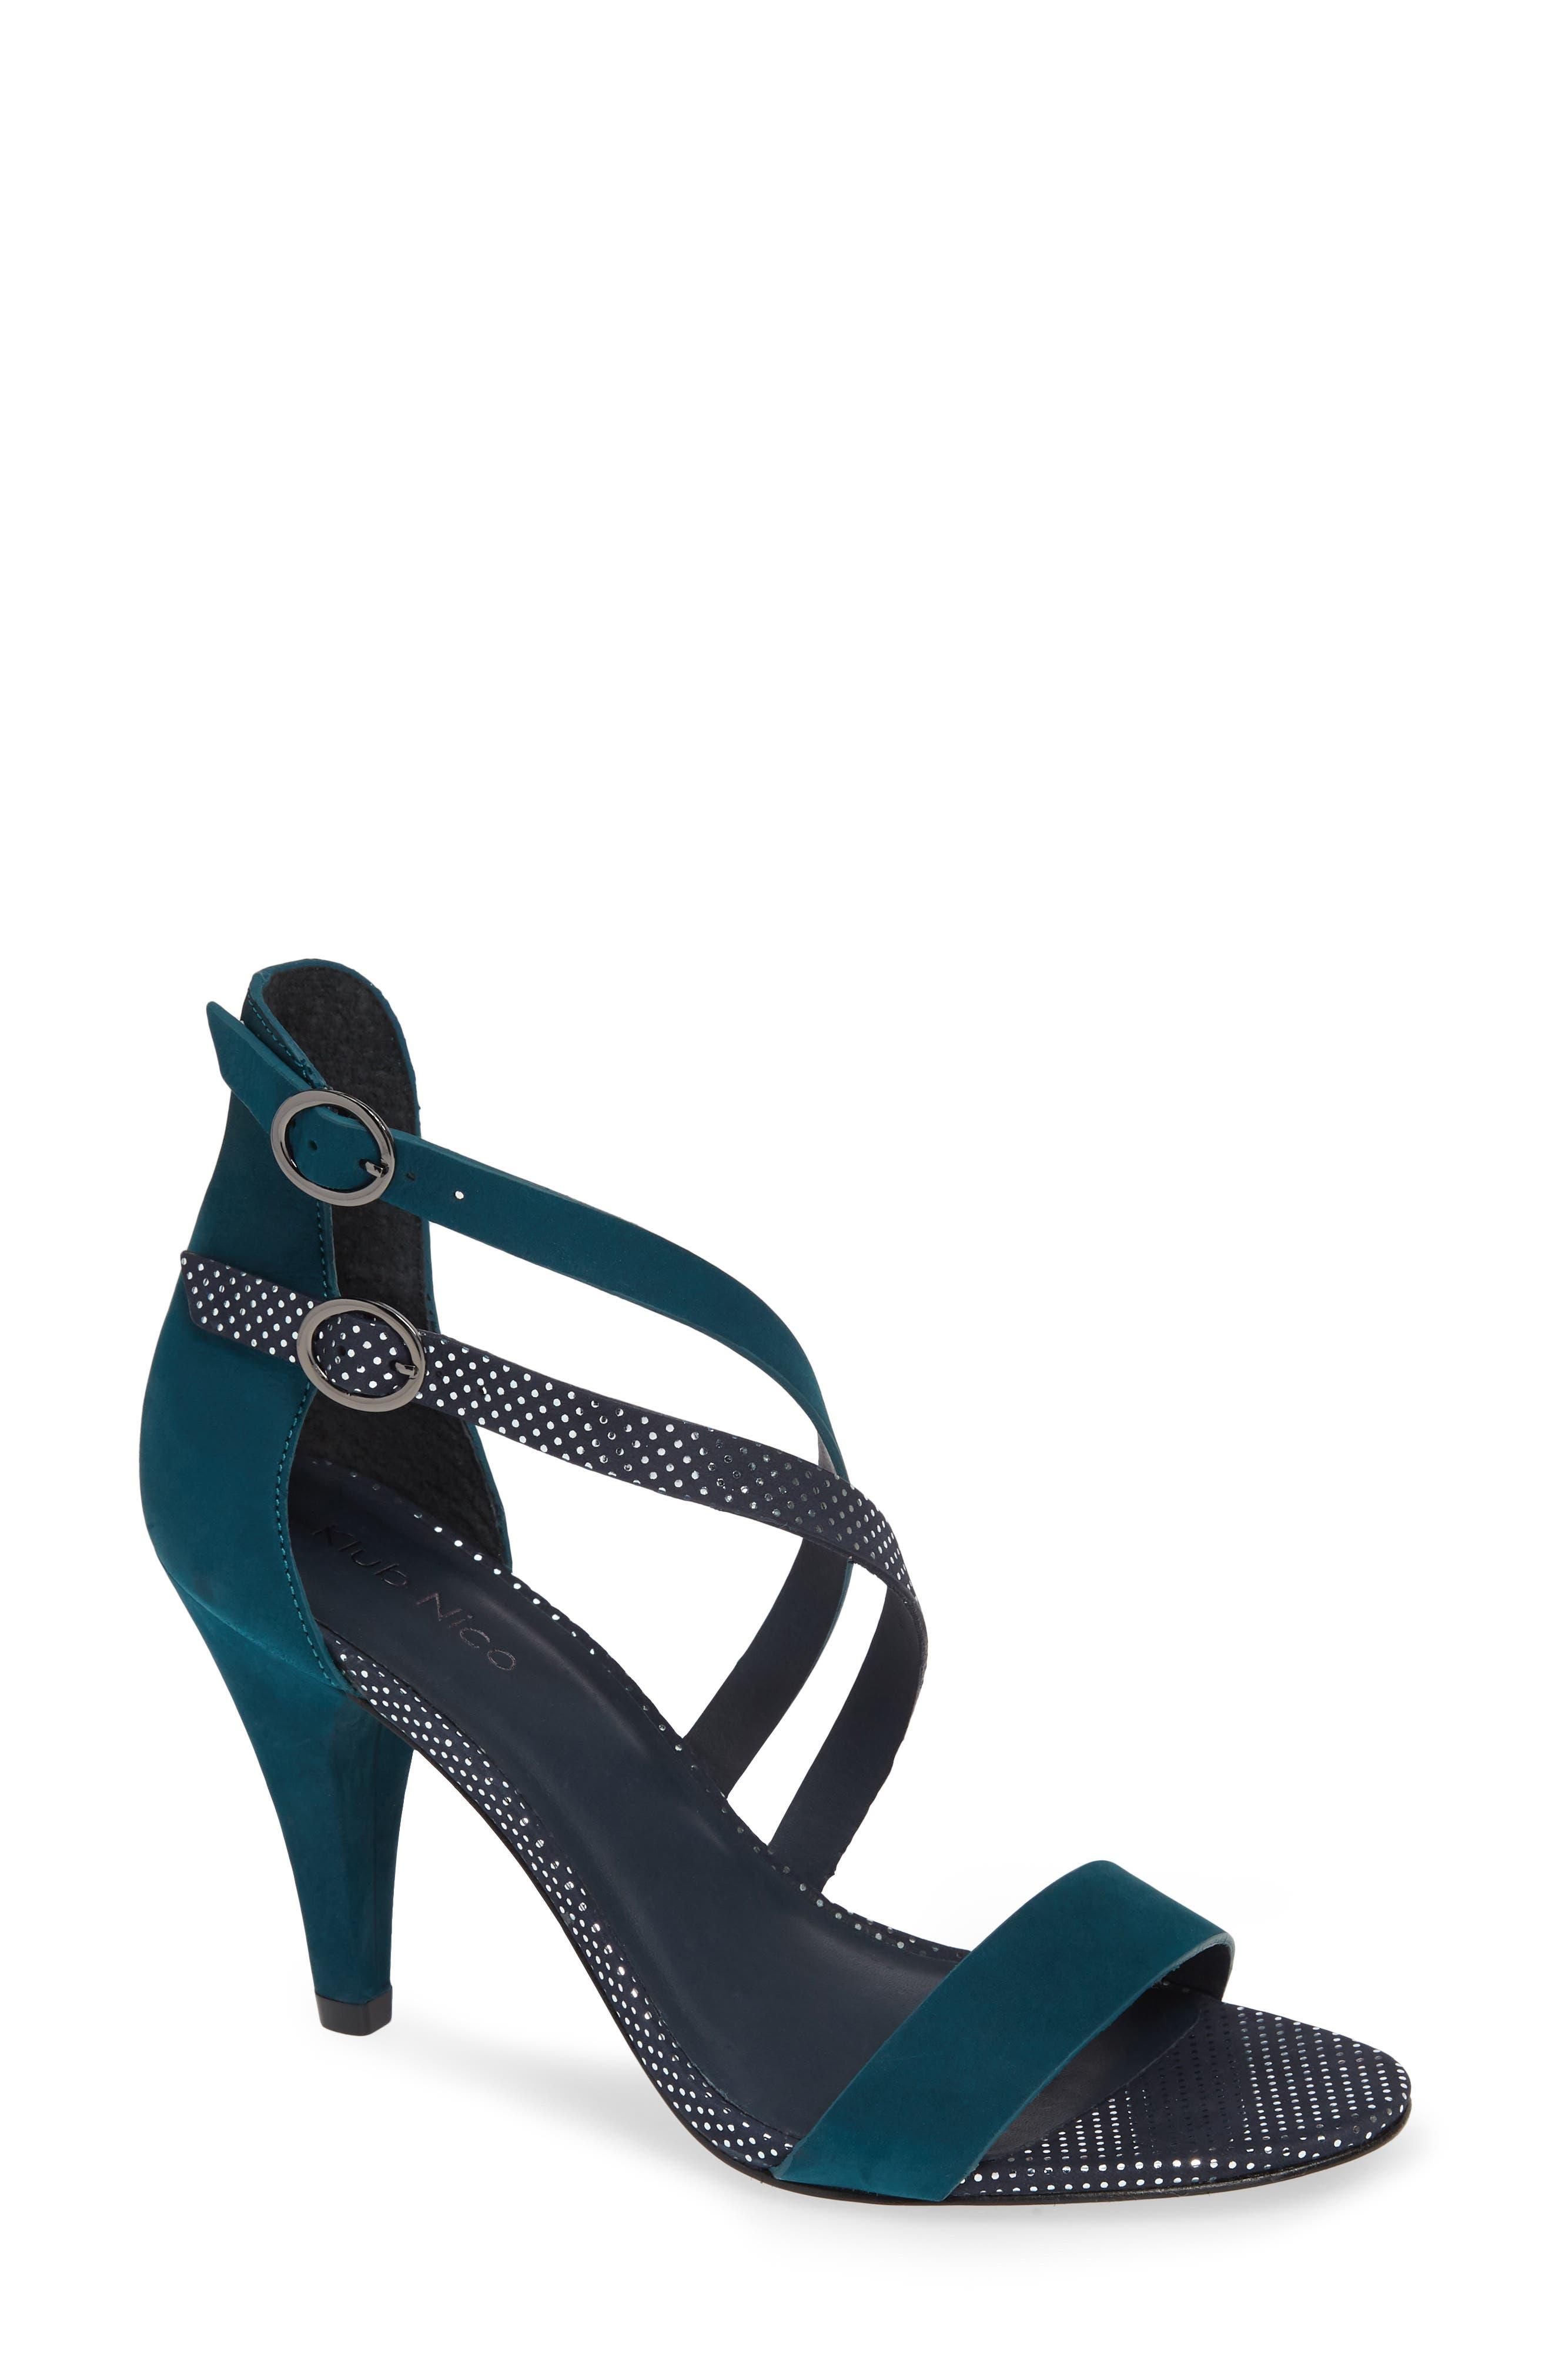 Klub Nico Arden Sandal, Blue/green